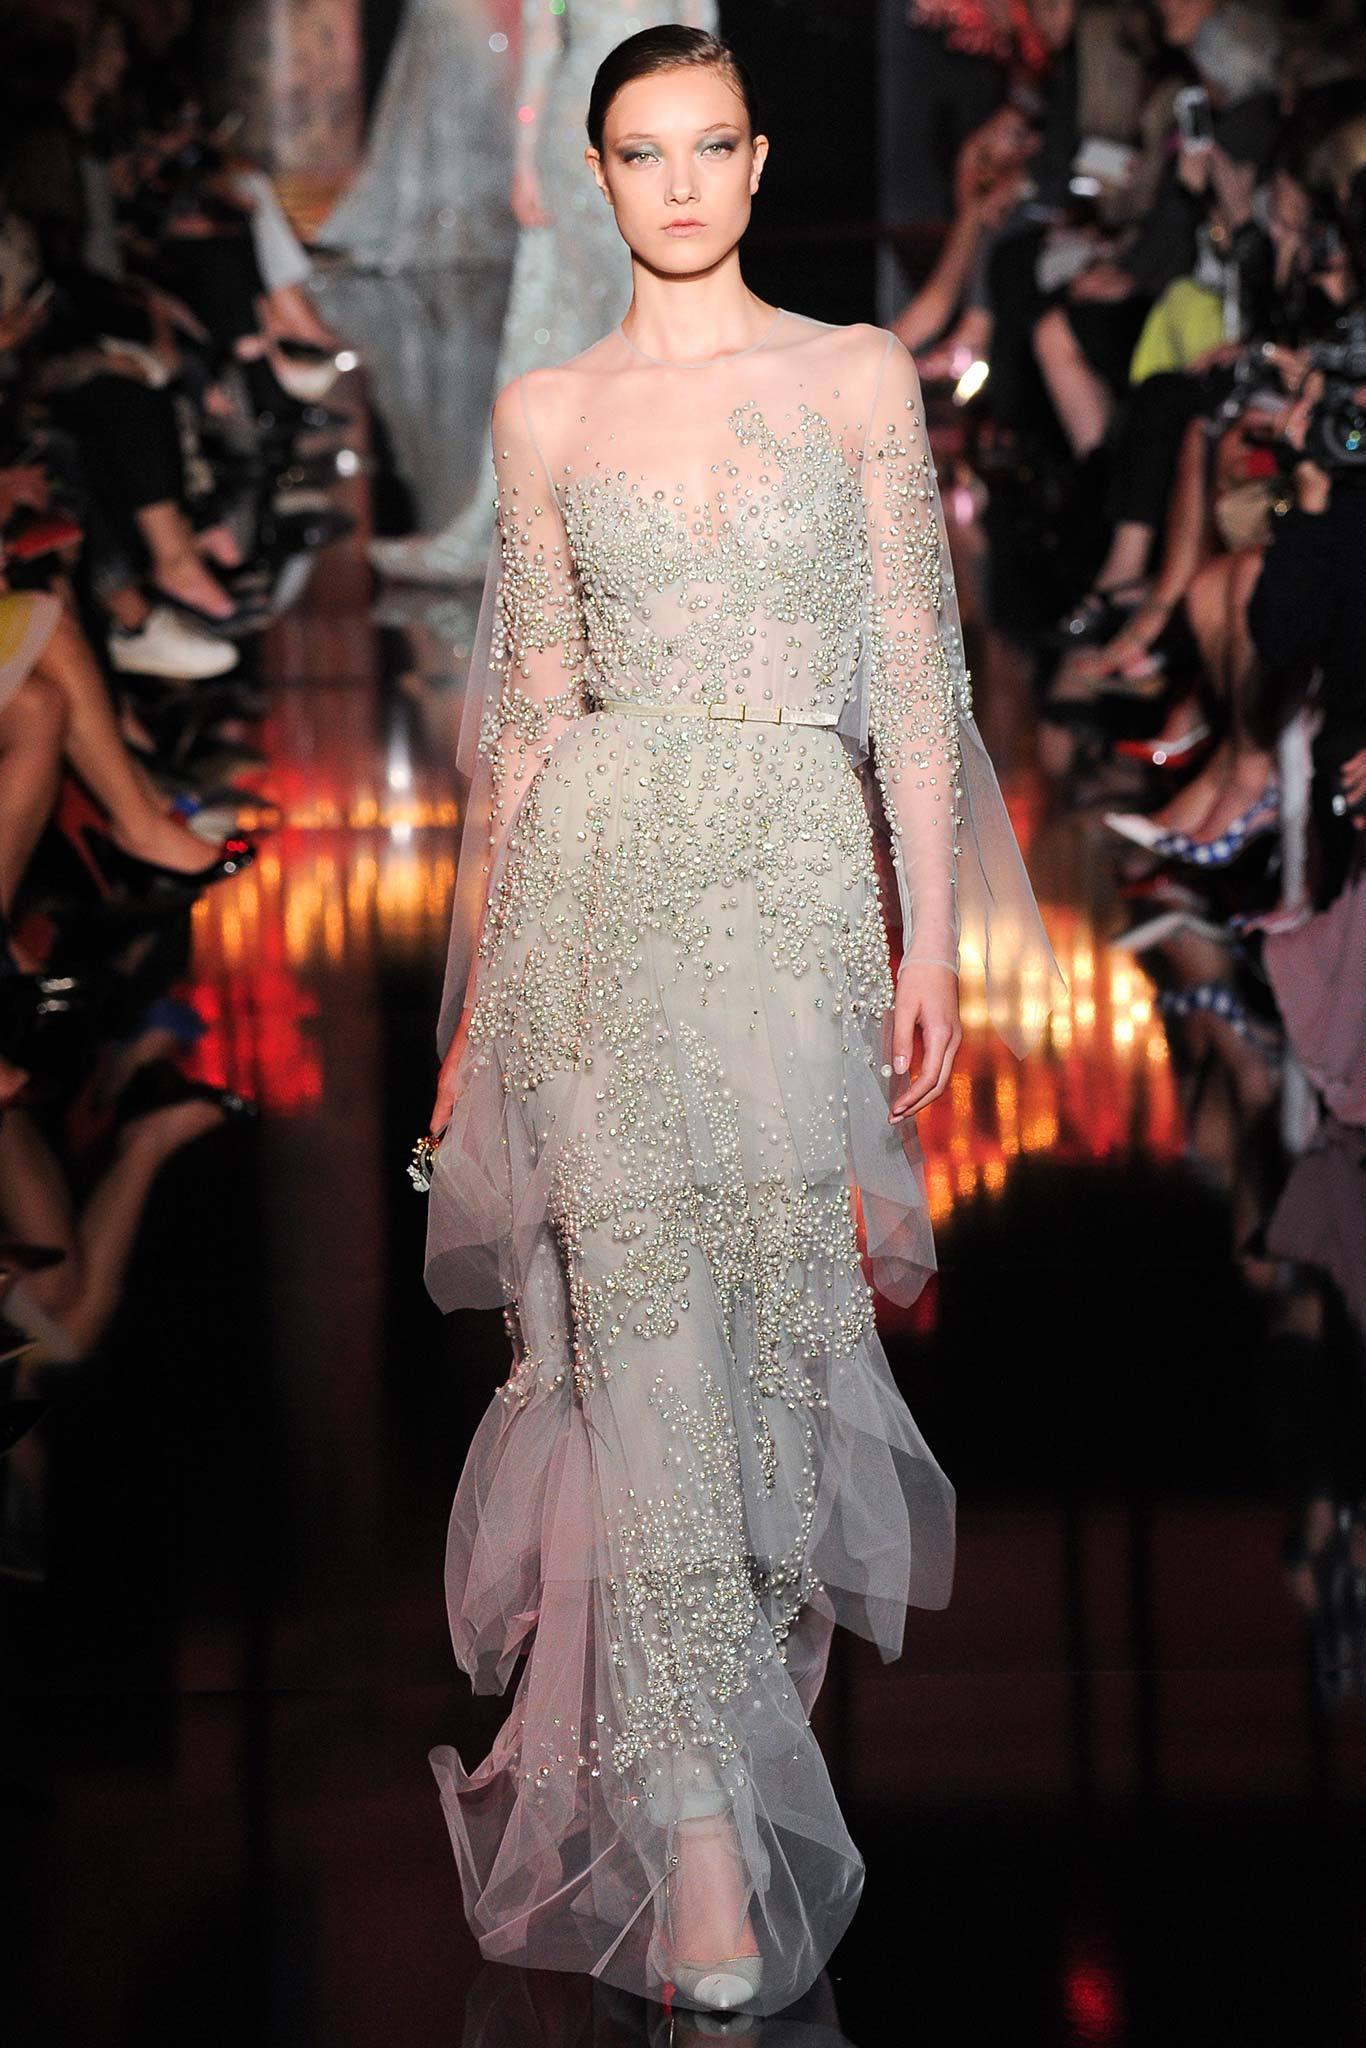 Elie-Saab-Couture-Fall2014-18.JPG